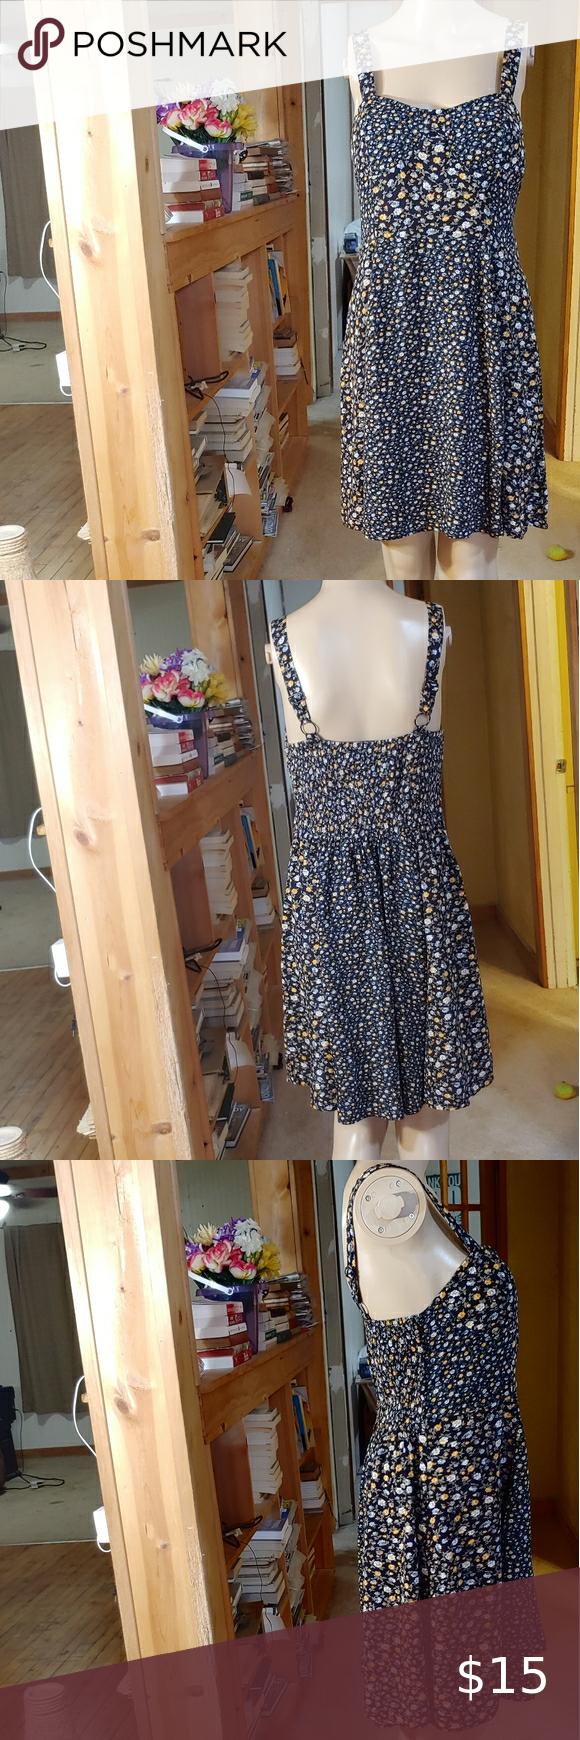 American Eagle Swing Dress Built In Bra Straps Floral Print Dress Summer Swing Dress Printed Summer Dresses [ 1740 x 580 Pixel ]